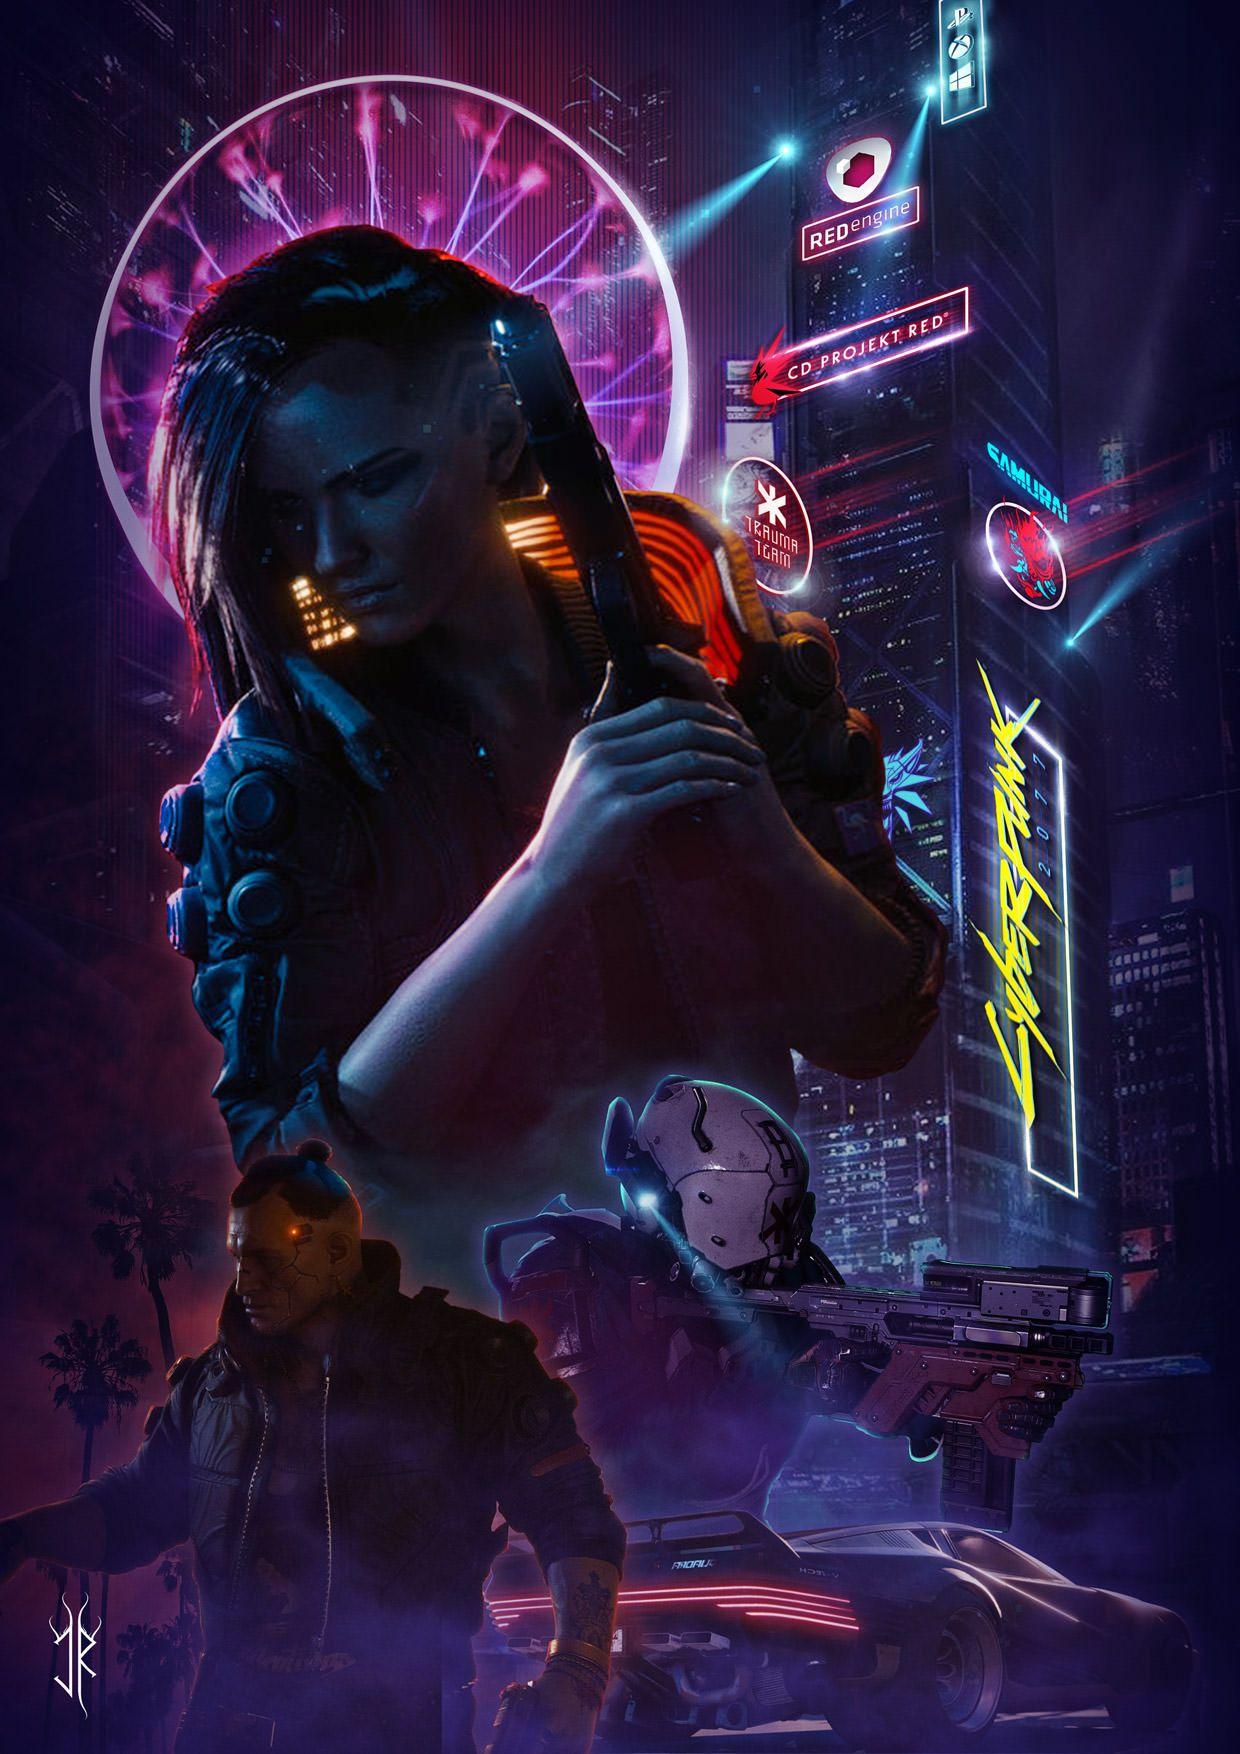 Cyberpunk 2077 Poster Posters Cyberpunk